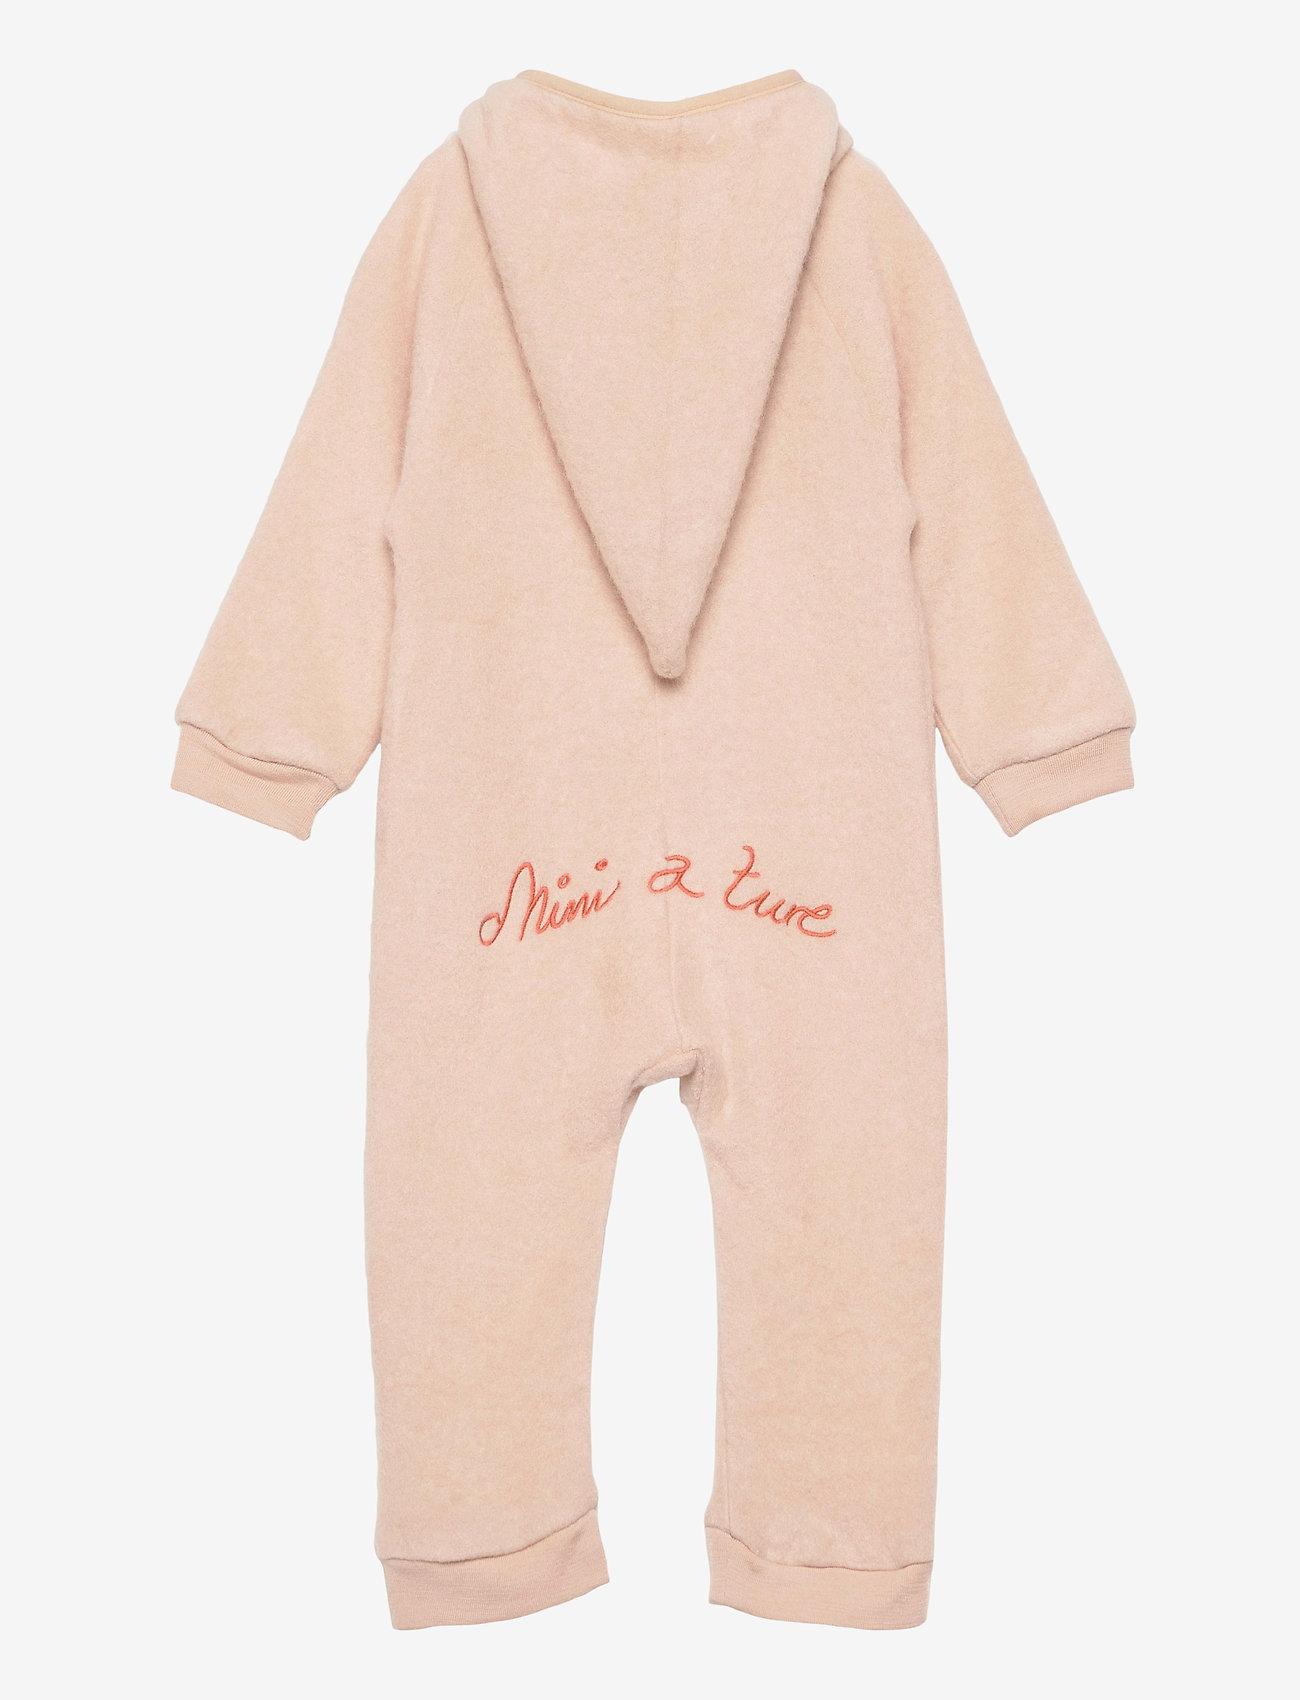 Mini A Ture - Adel Romper, B - outerwear - rose dust - 1